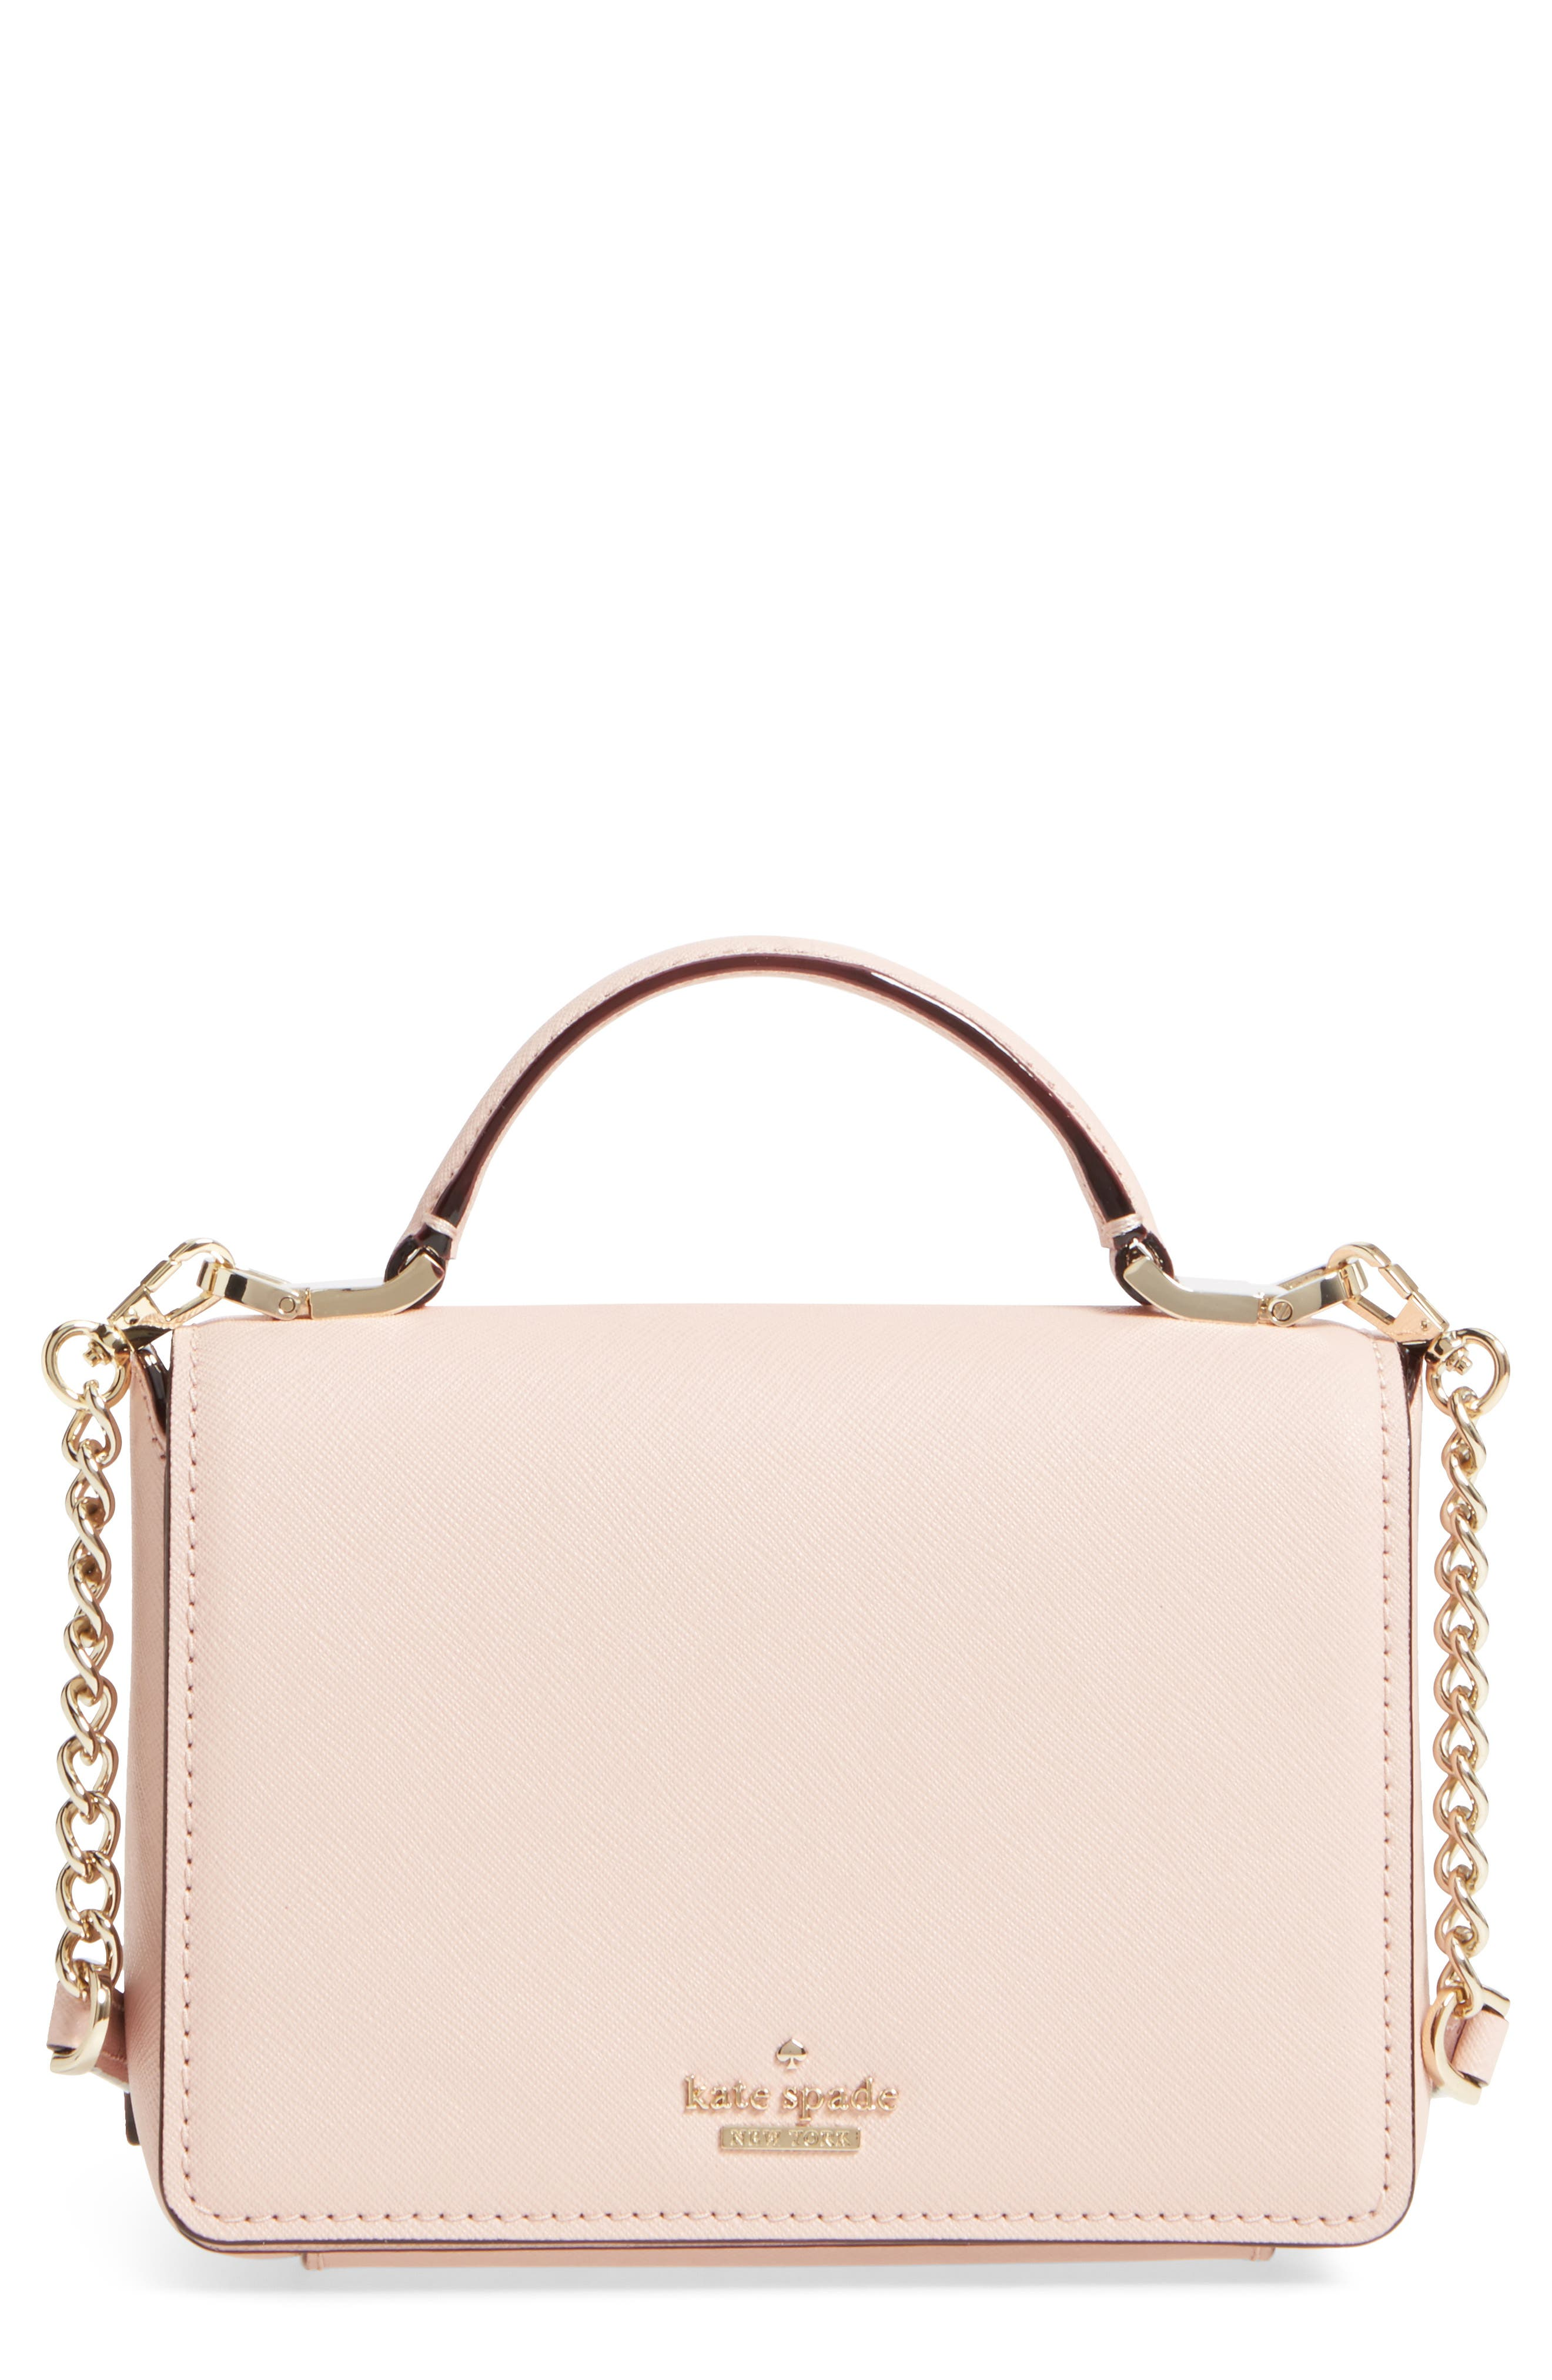 cameron street - hope saffiano leather crossbody bag,                             Main thumbnail 3, color,